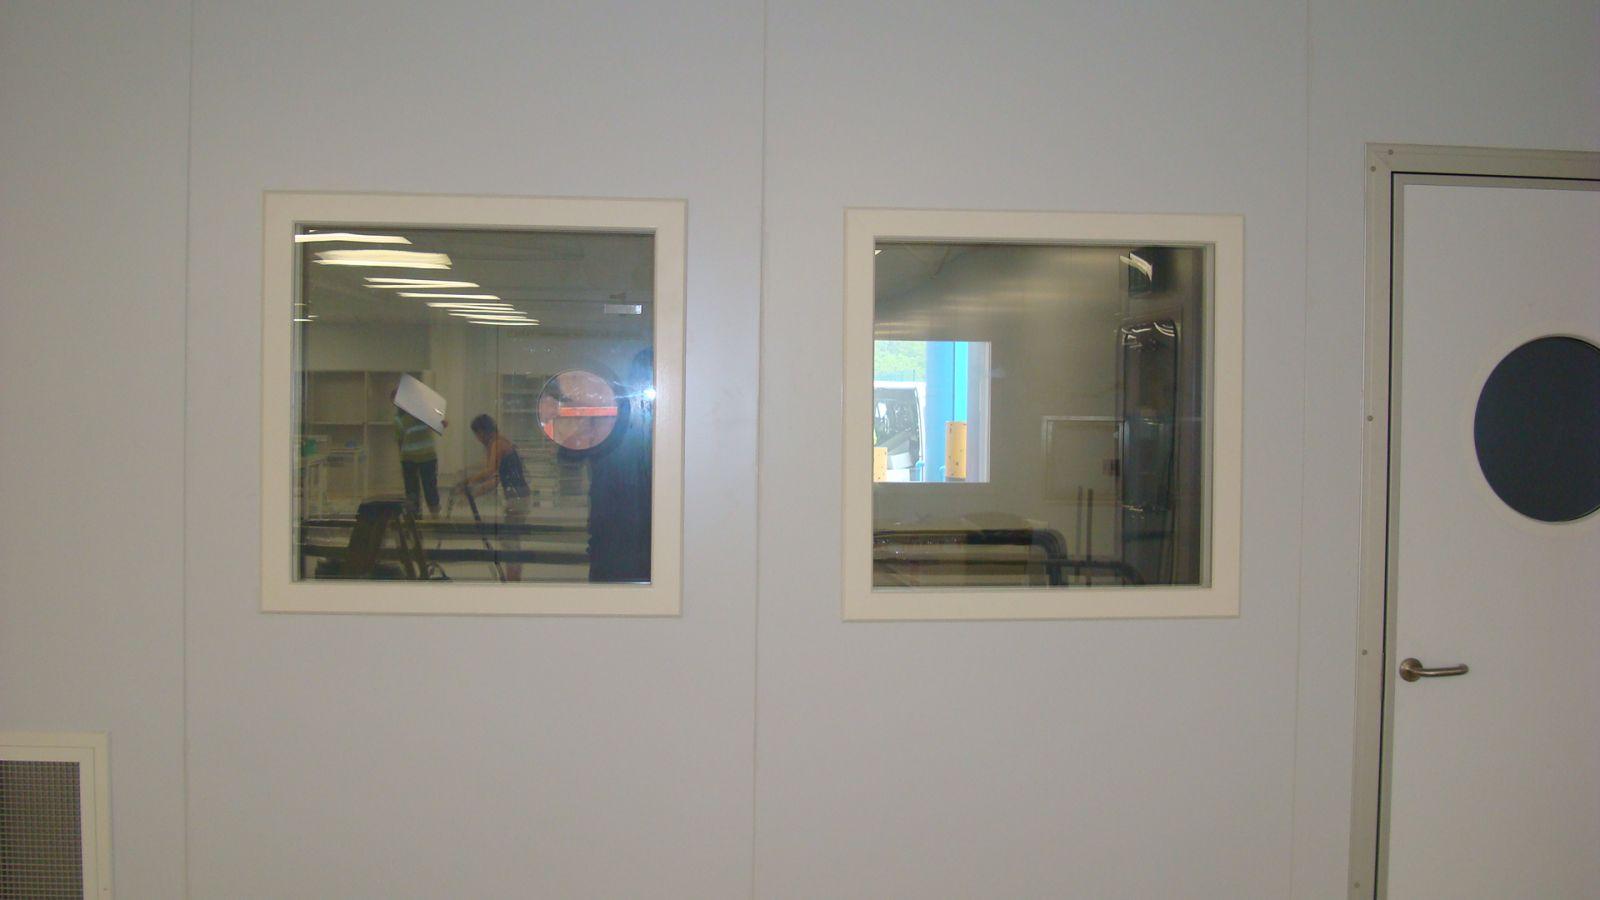 Vision Panels